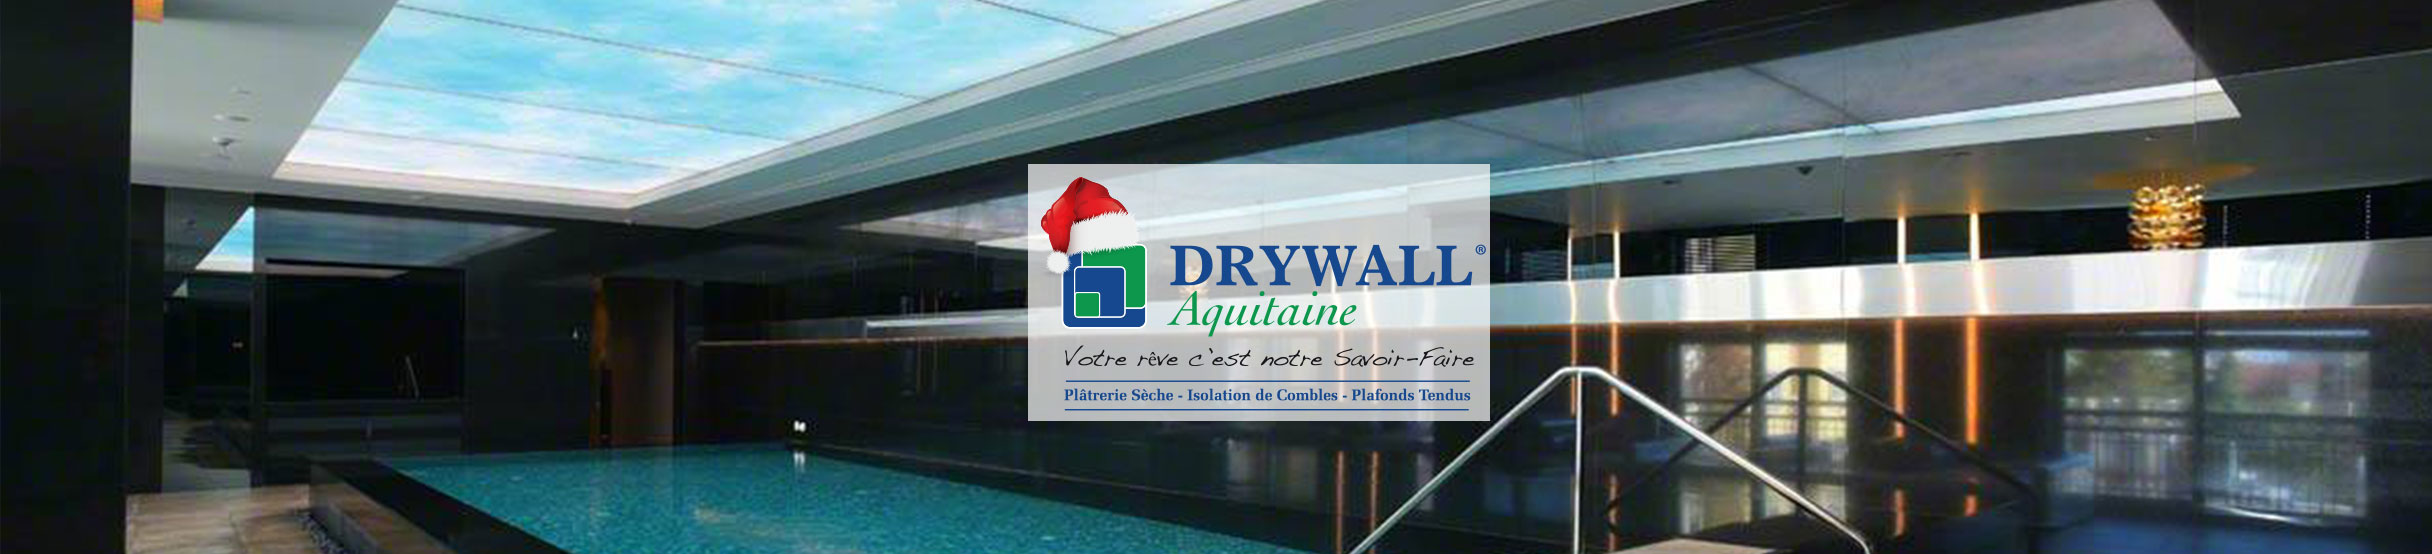 Plafonds tendus drywall aquitaine